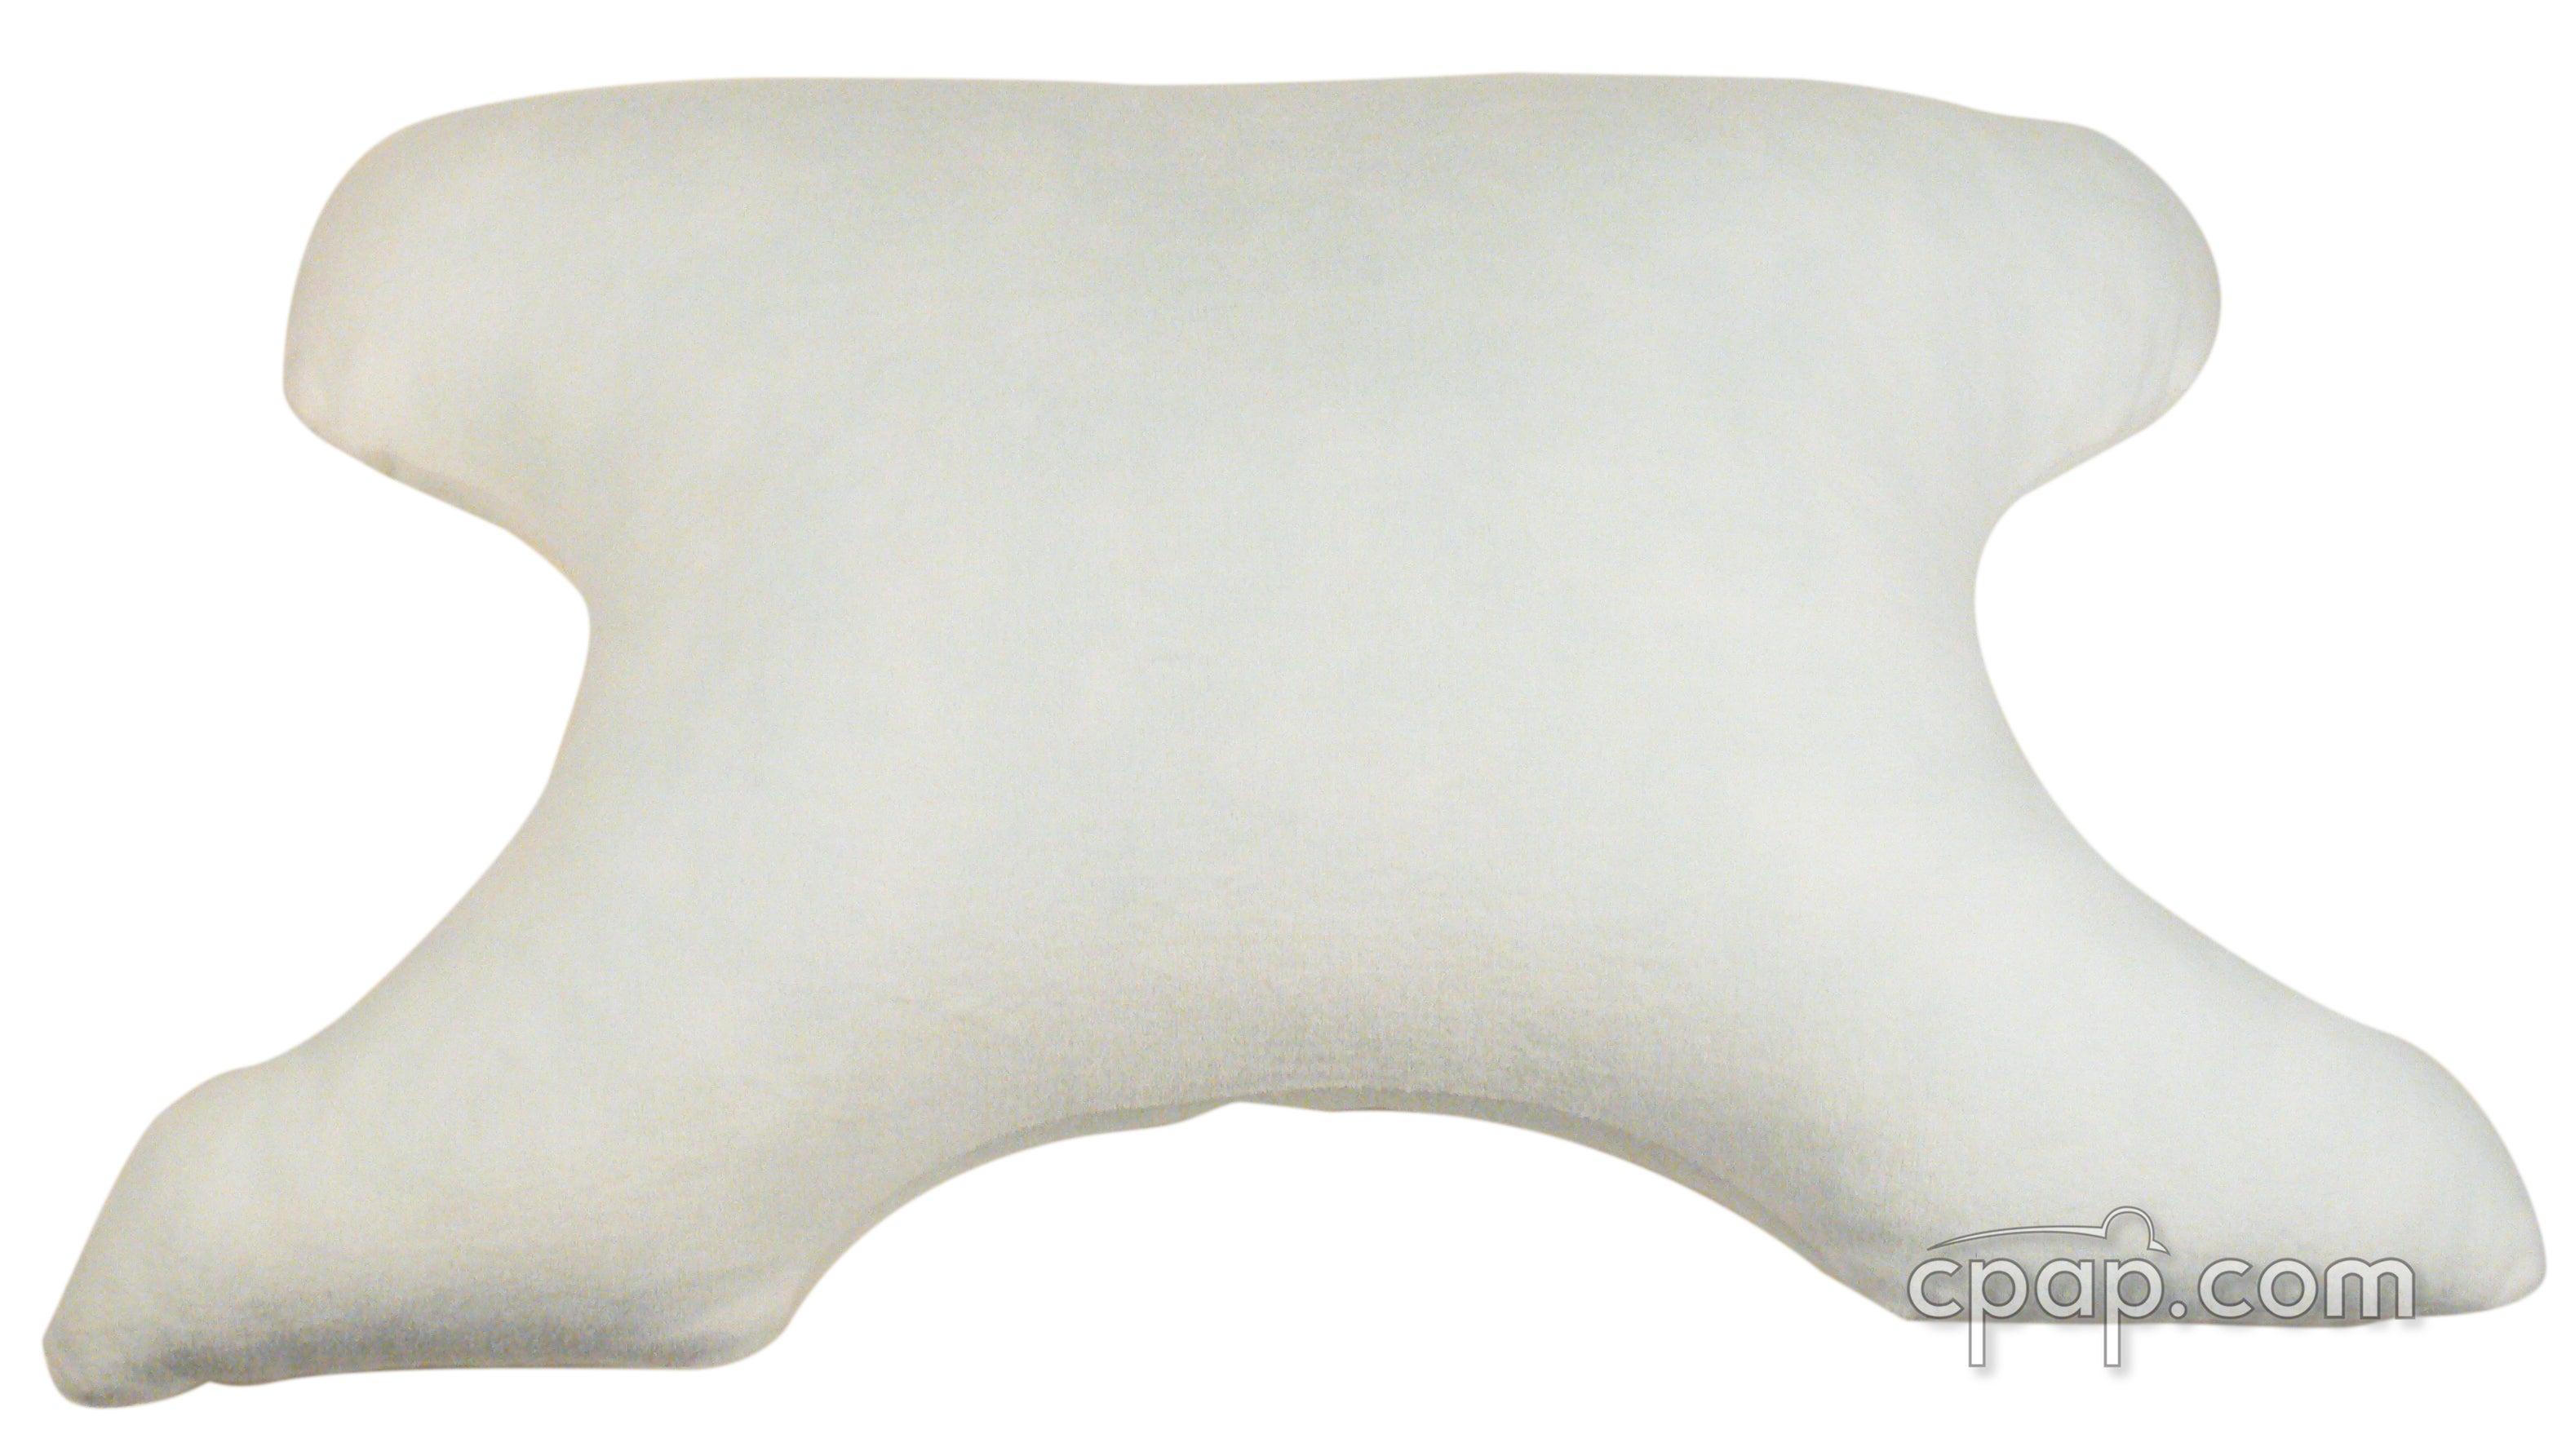 hudson-polar-foam-genesis-sleepap-pillow-no-case